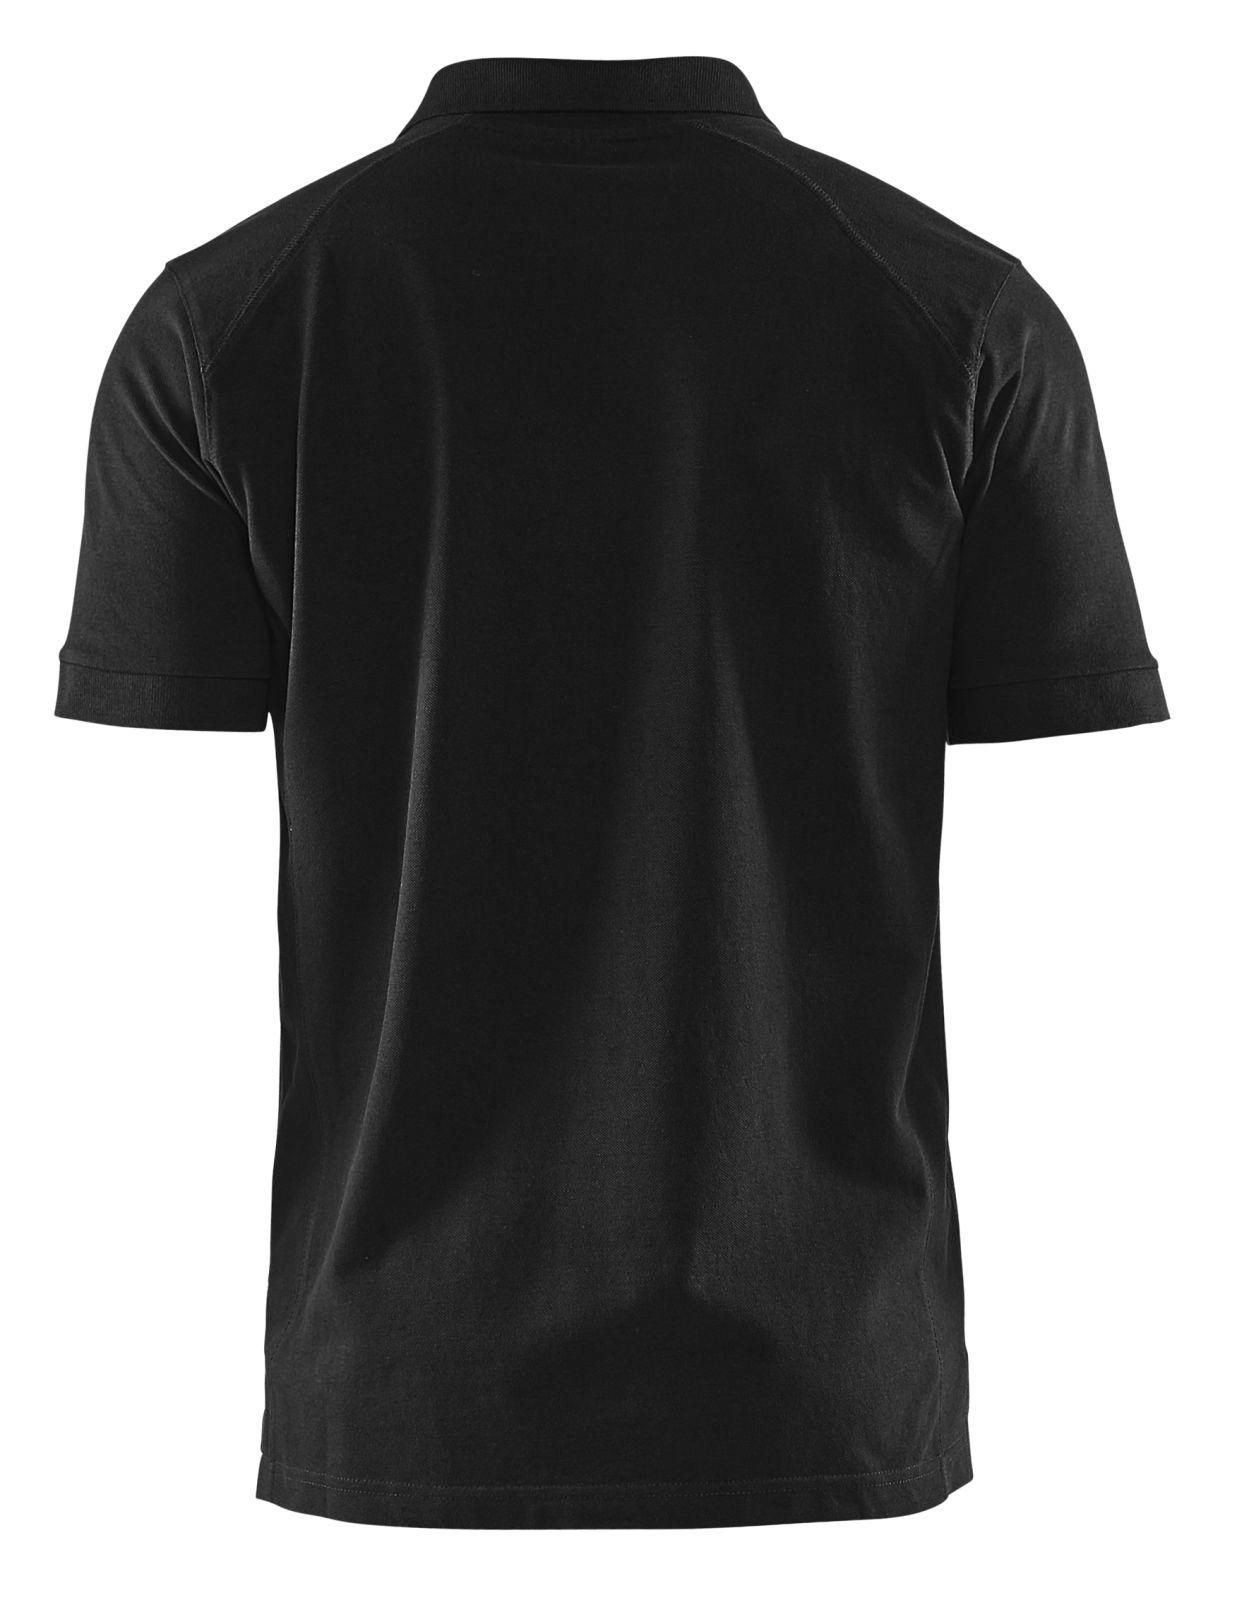 Blaklader Poloshirts 33241050 zwart(9900)